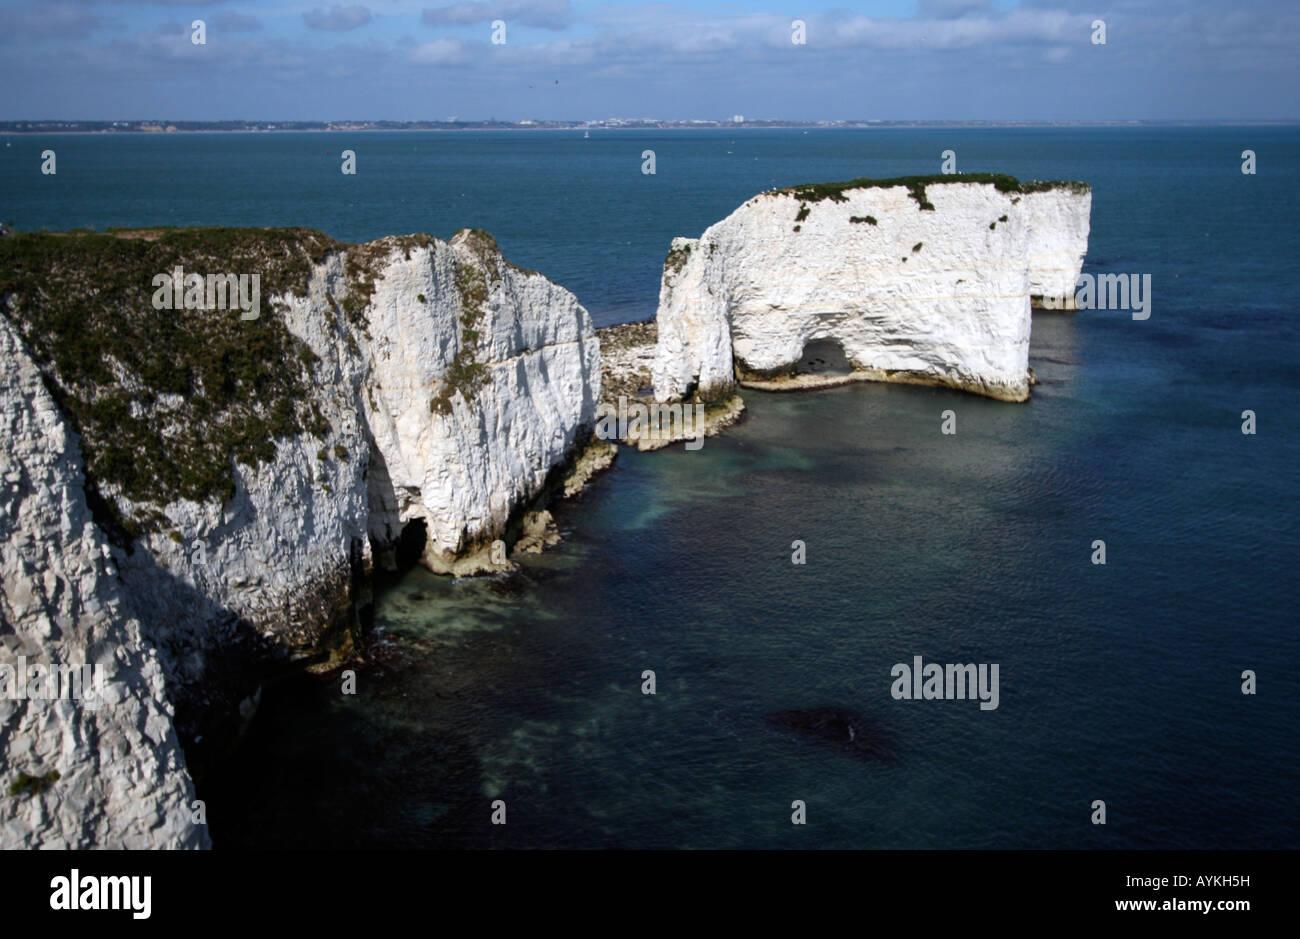 Clifs, vieille hary rock, Jurassic Coast Banque D'Images